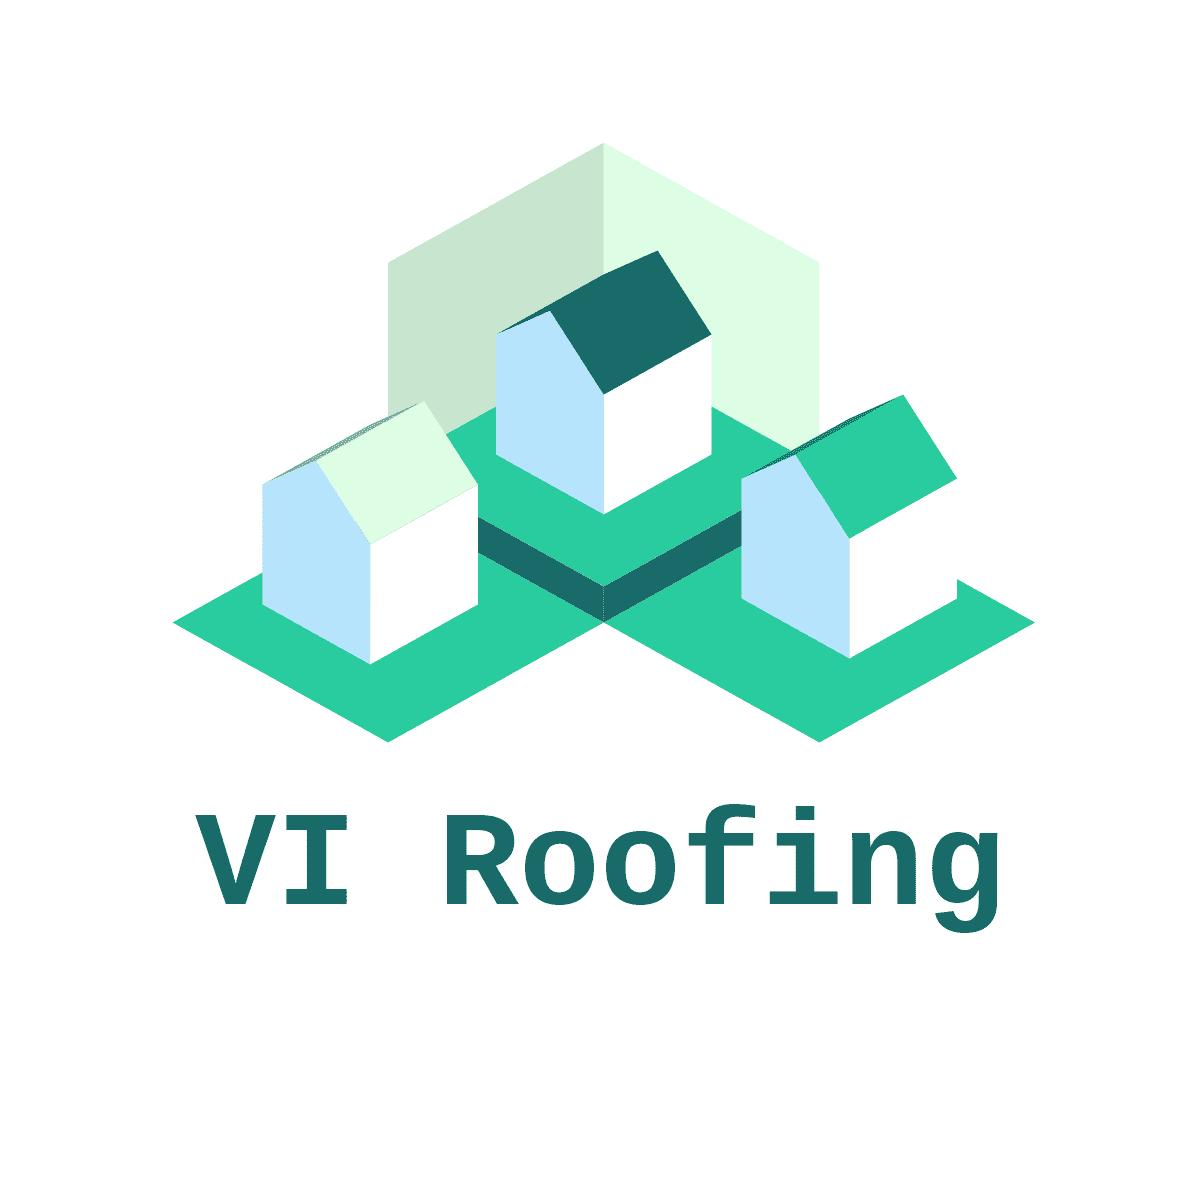 VI Roofing logo